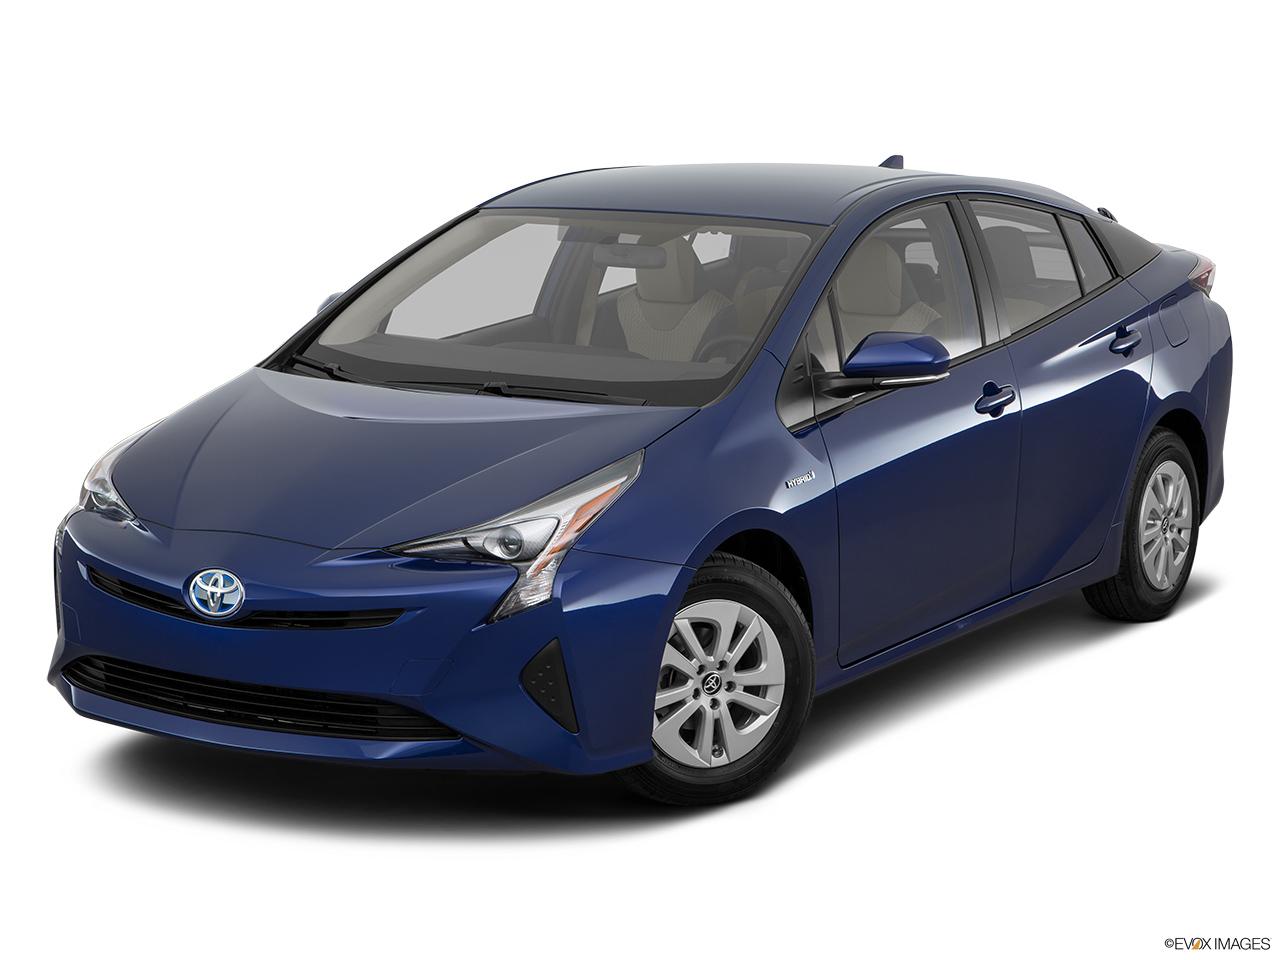 Image Result For Honda Civic New Price New Honda Release